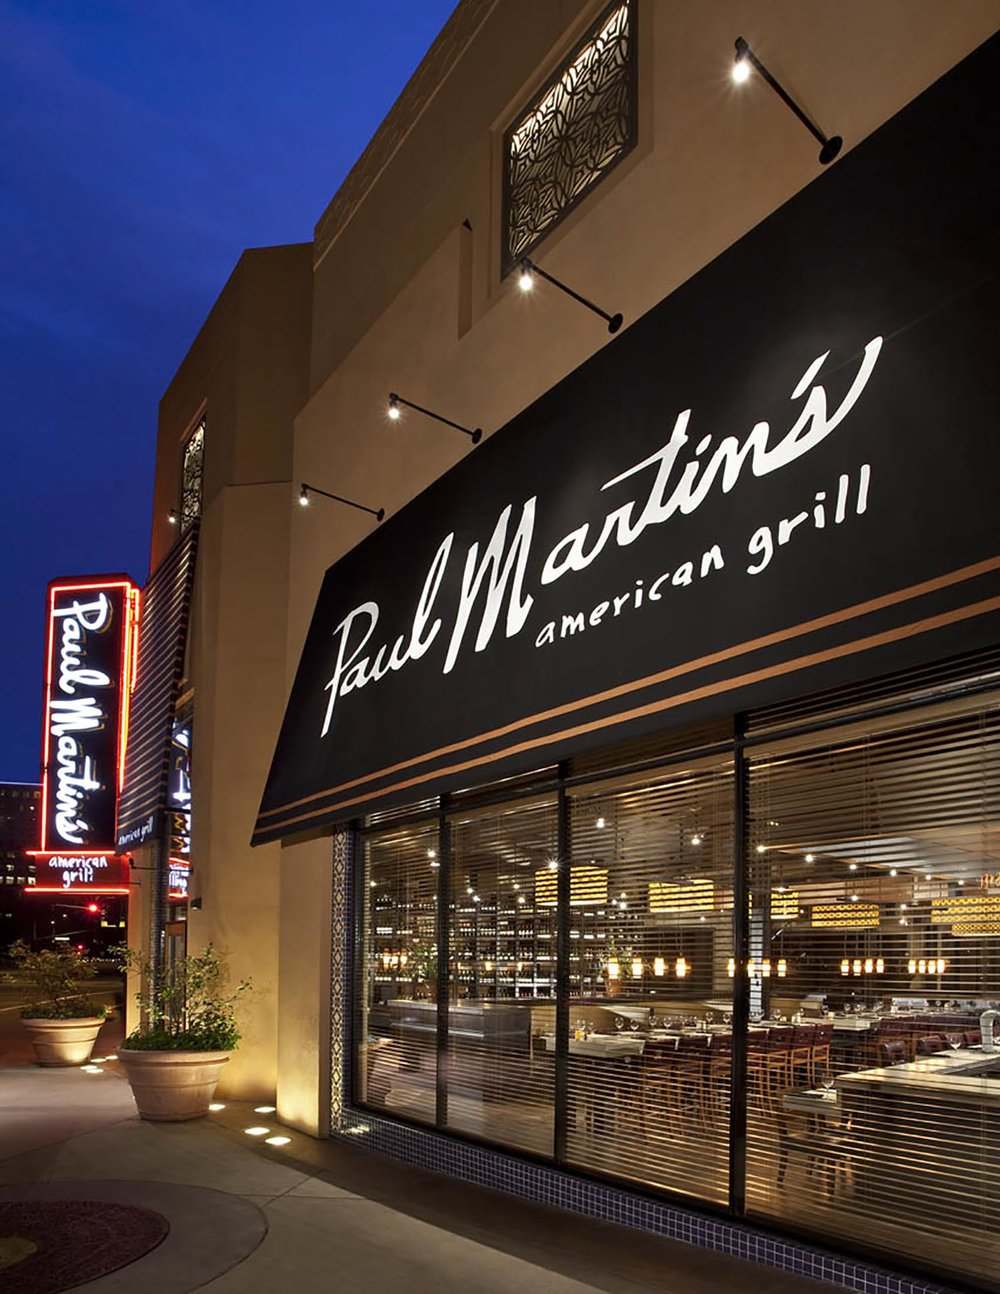 Paul-Martins-American-Grill-Irvine-1.jpg